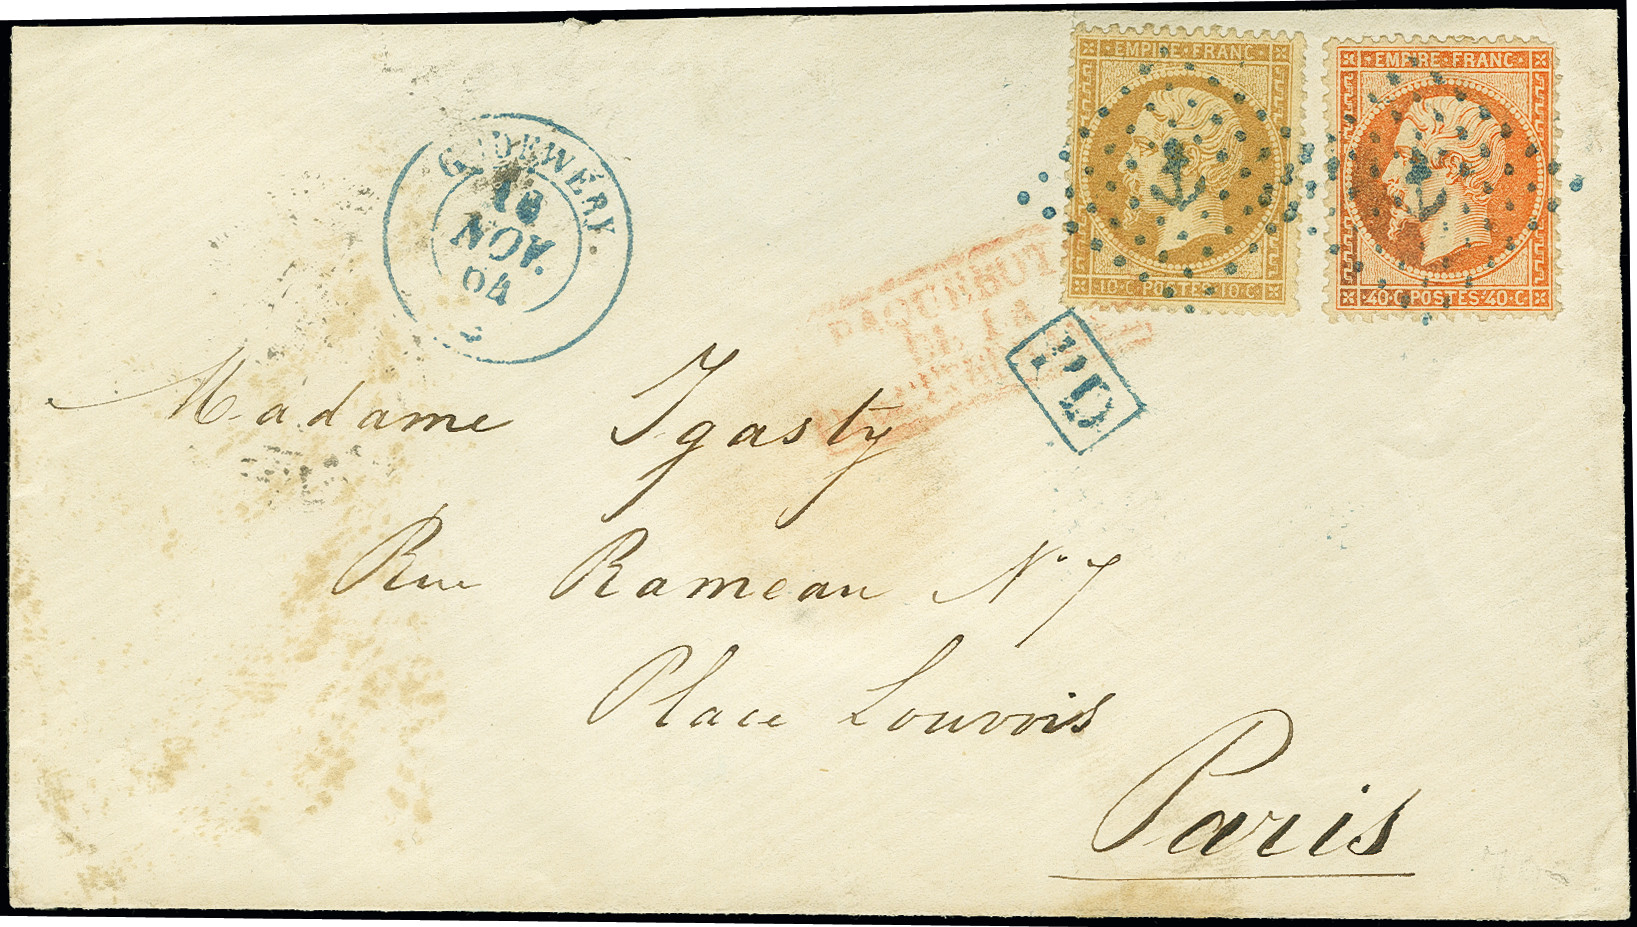 Lot 1145 - Main catalogue foreign ship mail -  Heinrich Koehler Auktionen Auction #368- Day 2